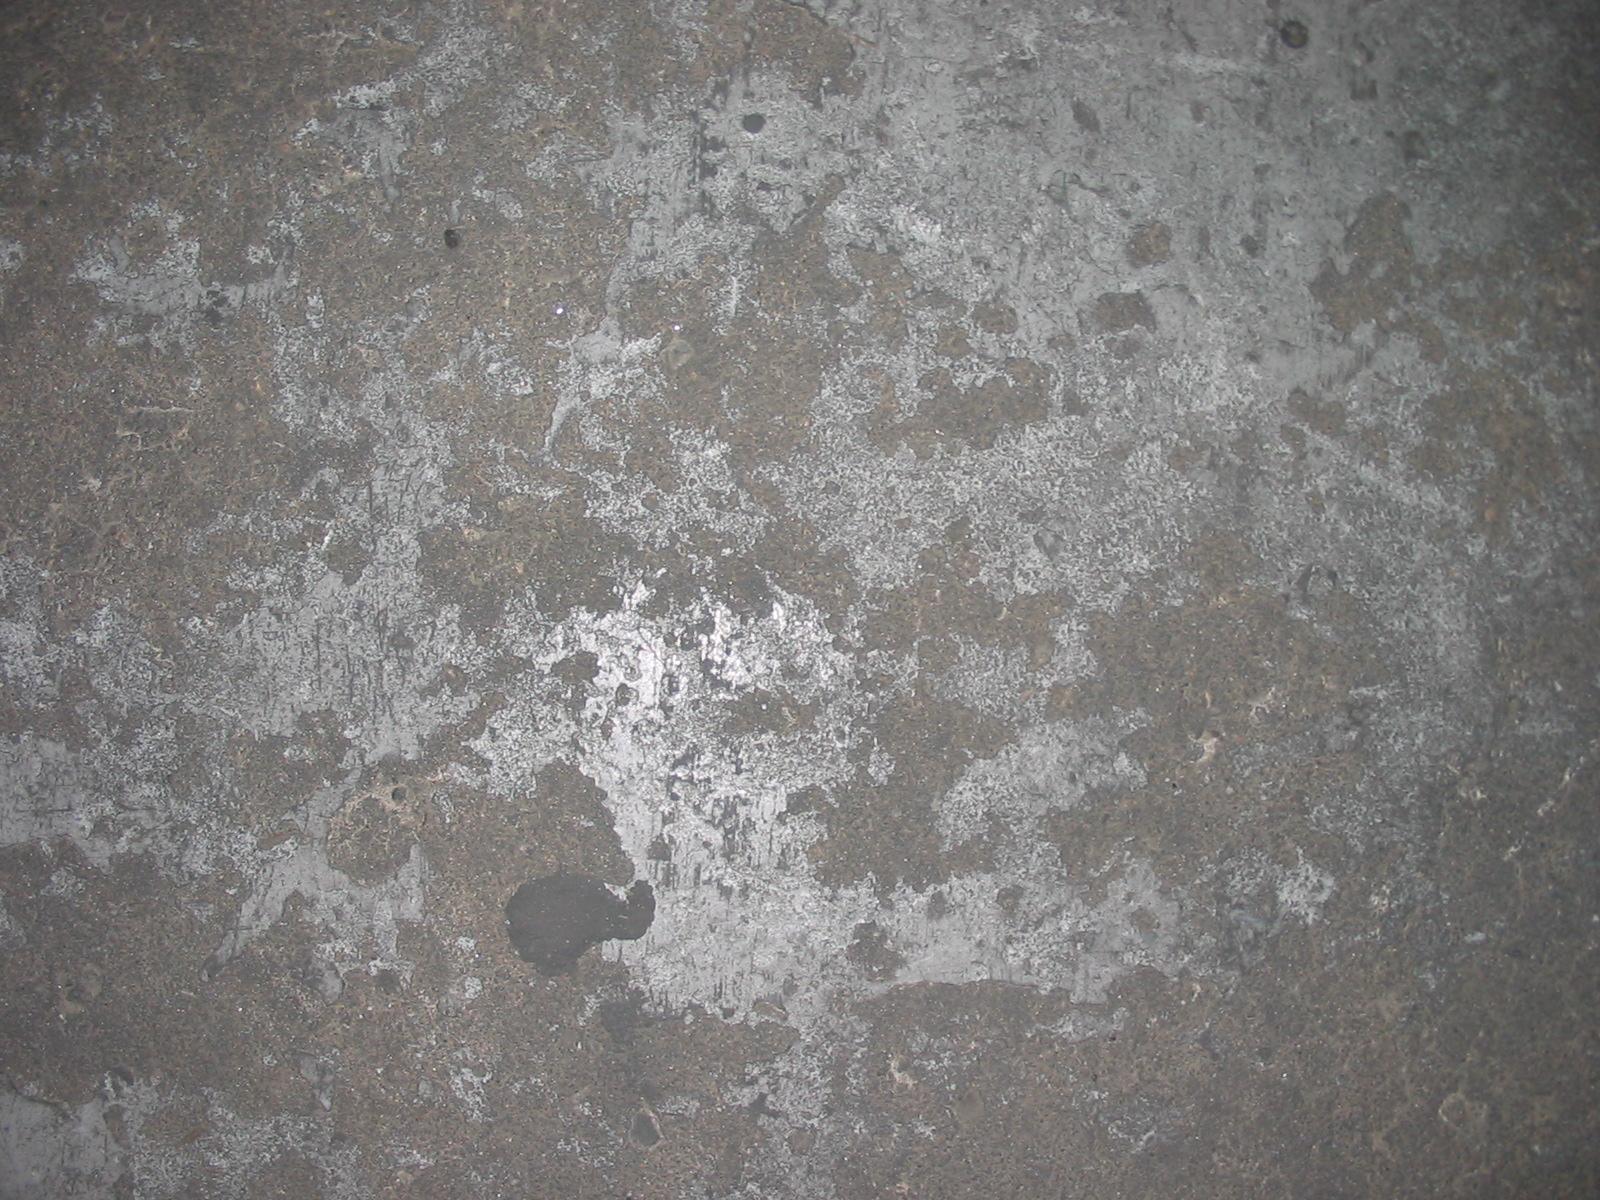 Worn Metal Texture Www Imgkid Com The Image Kid Has It